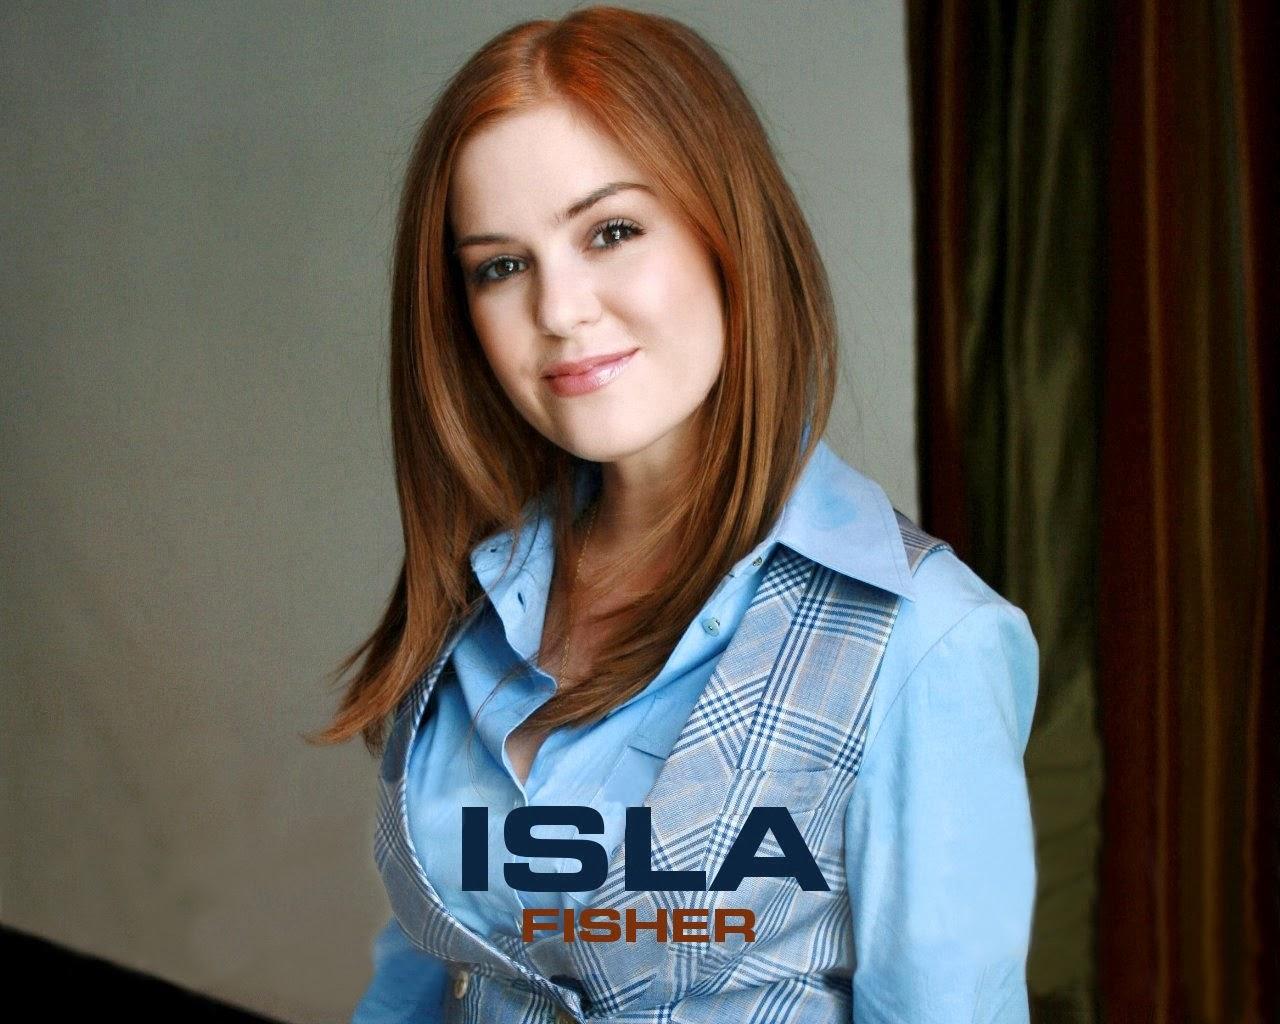 Karen Fisher hd Isla Fisher hd Wallpapers